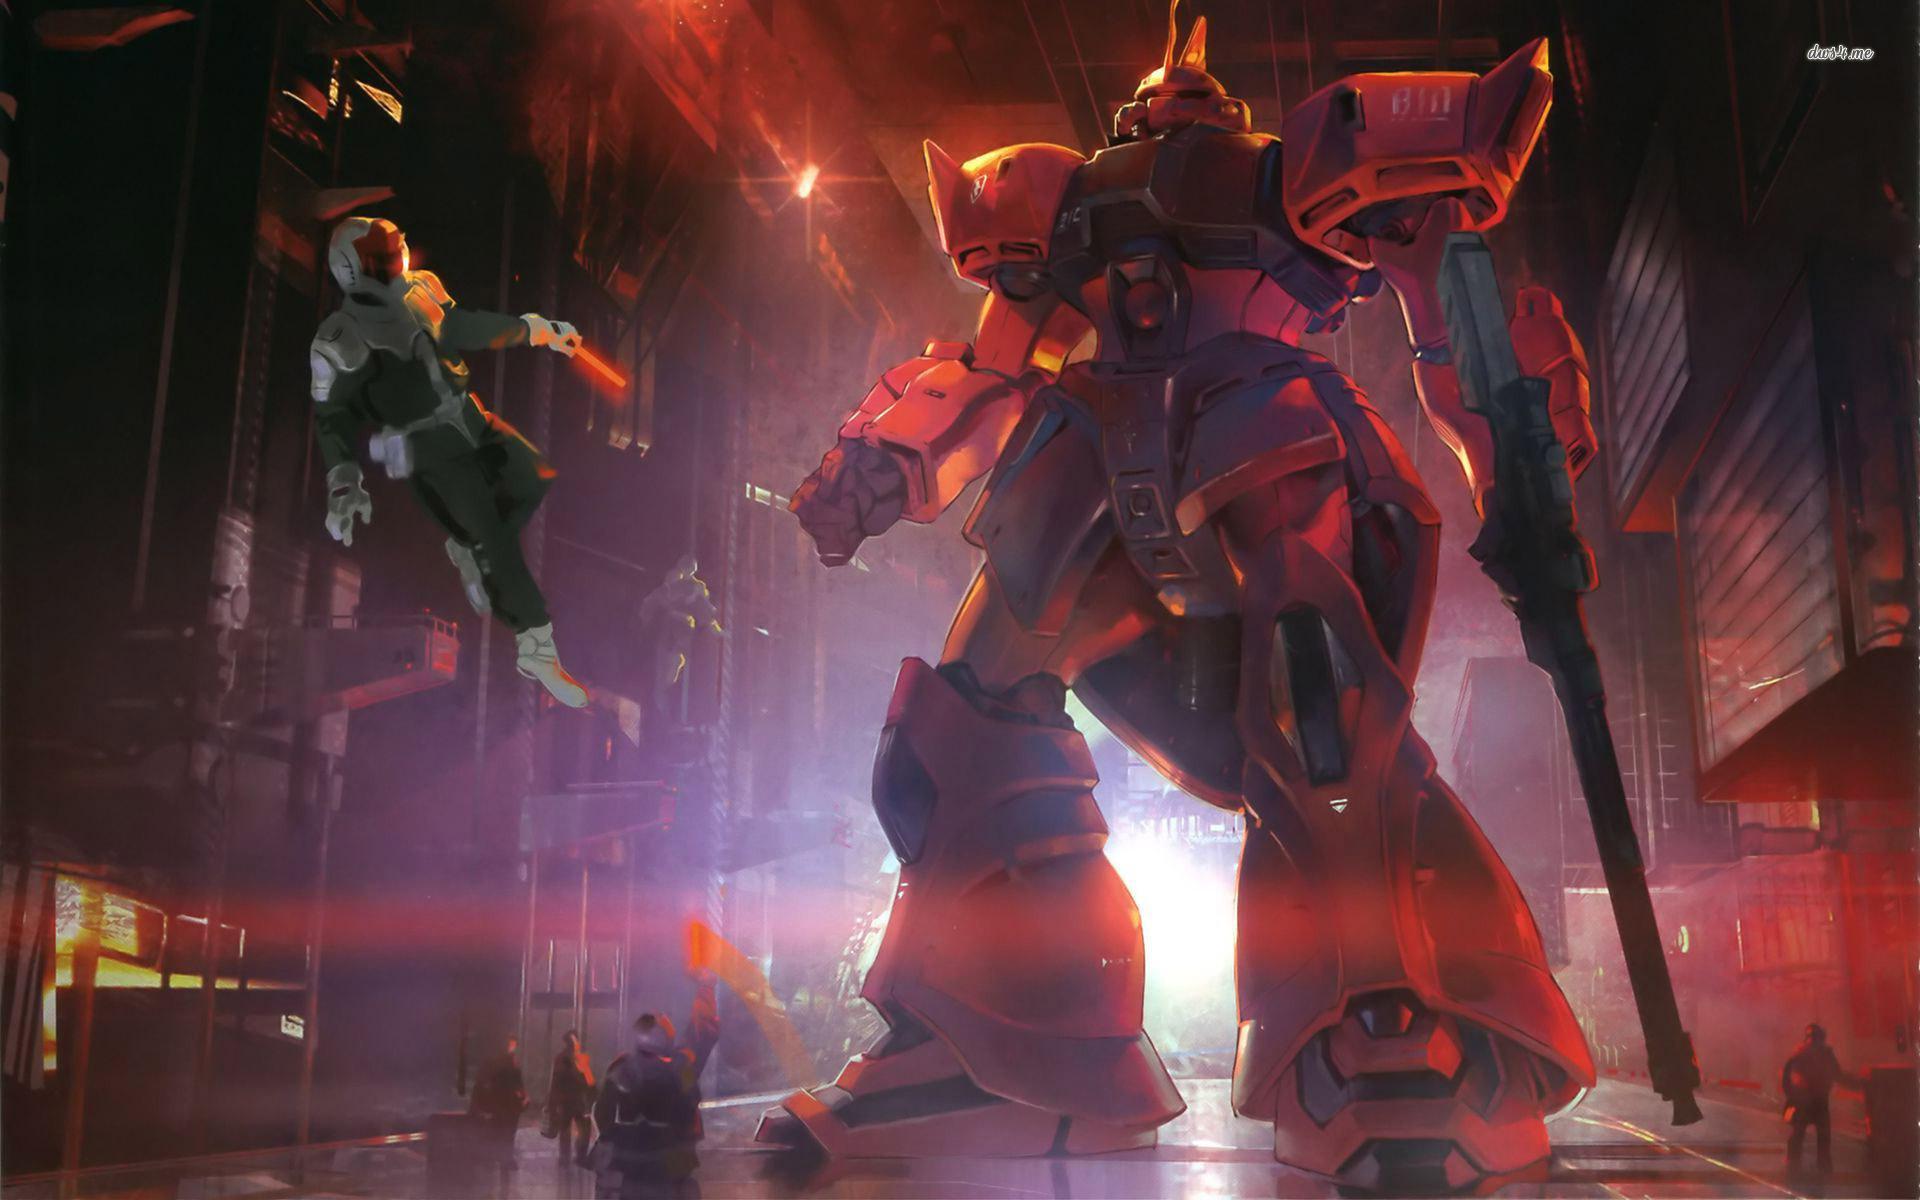 MS 14Jg Gelgoog Jager   Gundam wallpaper   Anime wallpapers   22815 1920x1200